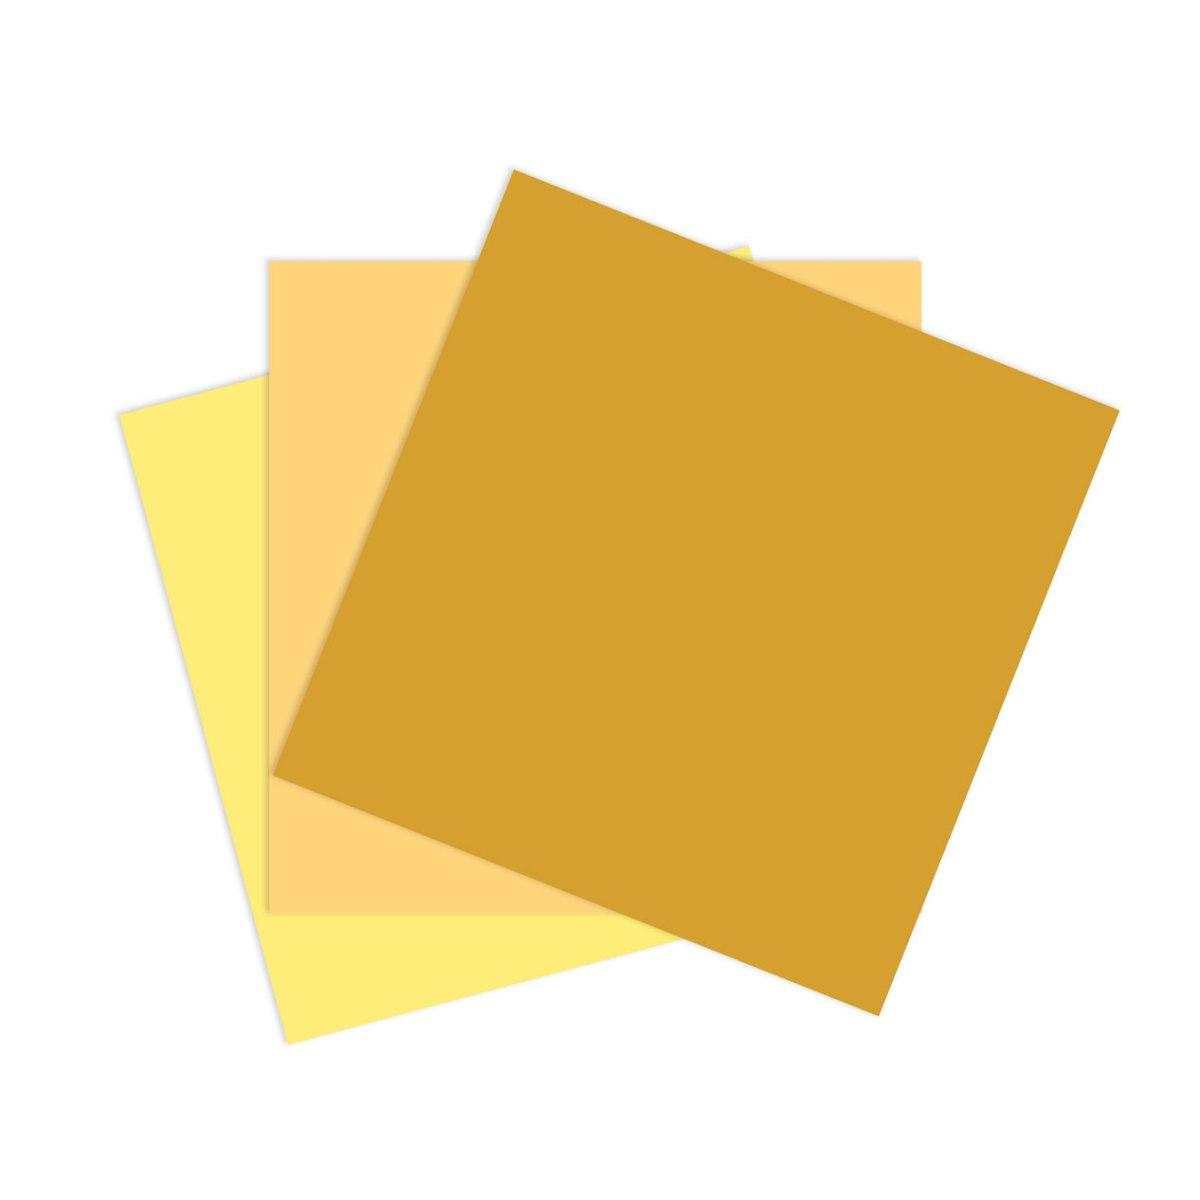 Cardstock Carnival #ctmh #closetomyheart #cardstock #exclusivecolorpalette #exclusivecolourpalatte #ctmhcolors #cmthcolours #yellow #lemonade #canary #saffron